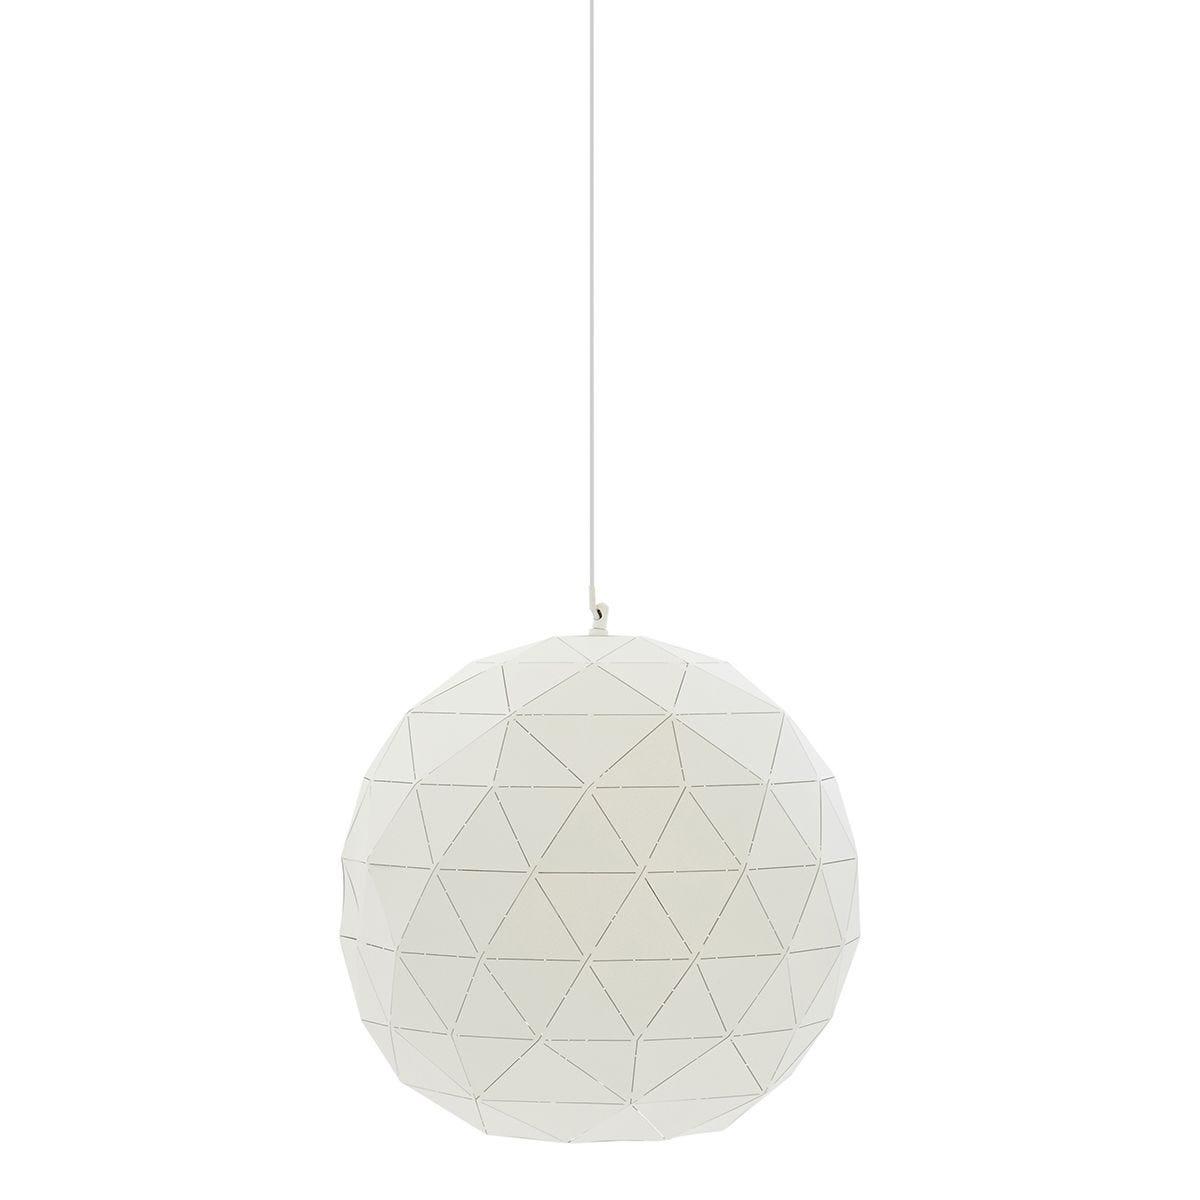 Premier Housewares Mateo Geometric Light - White Finish